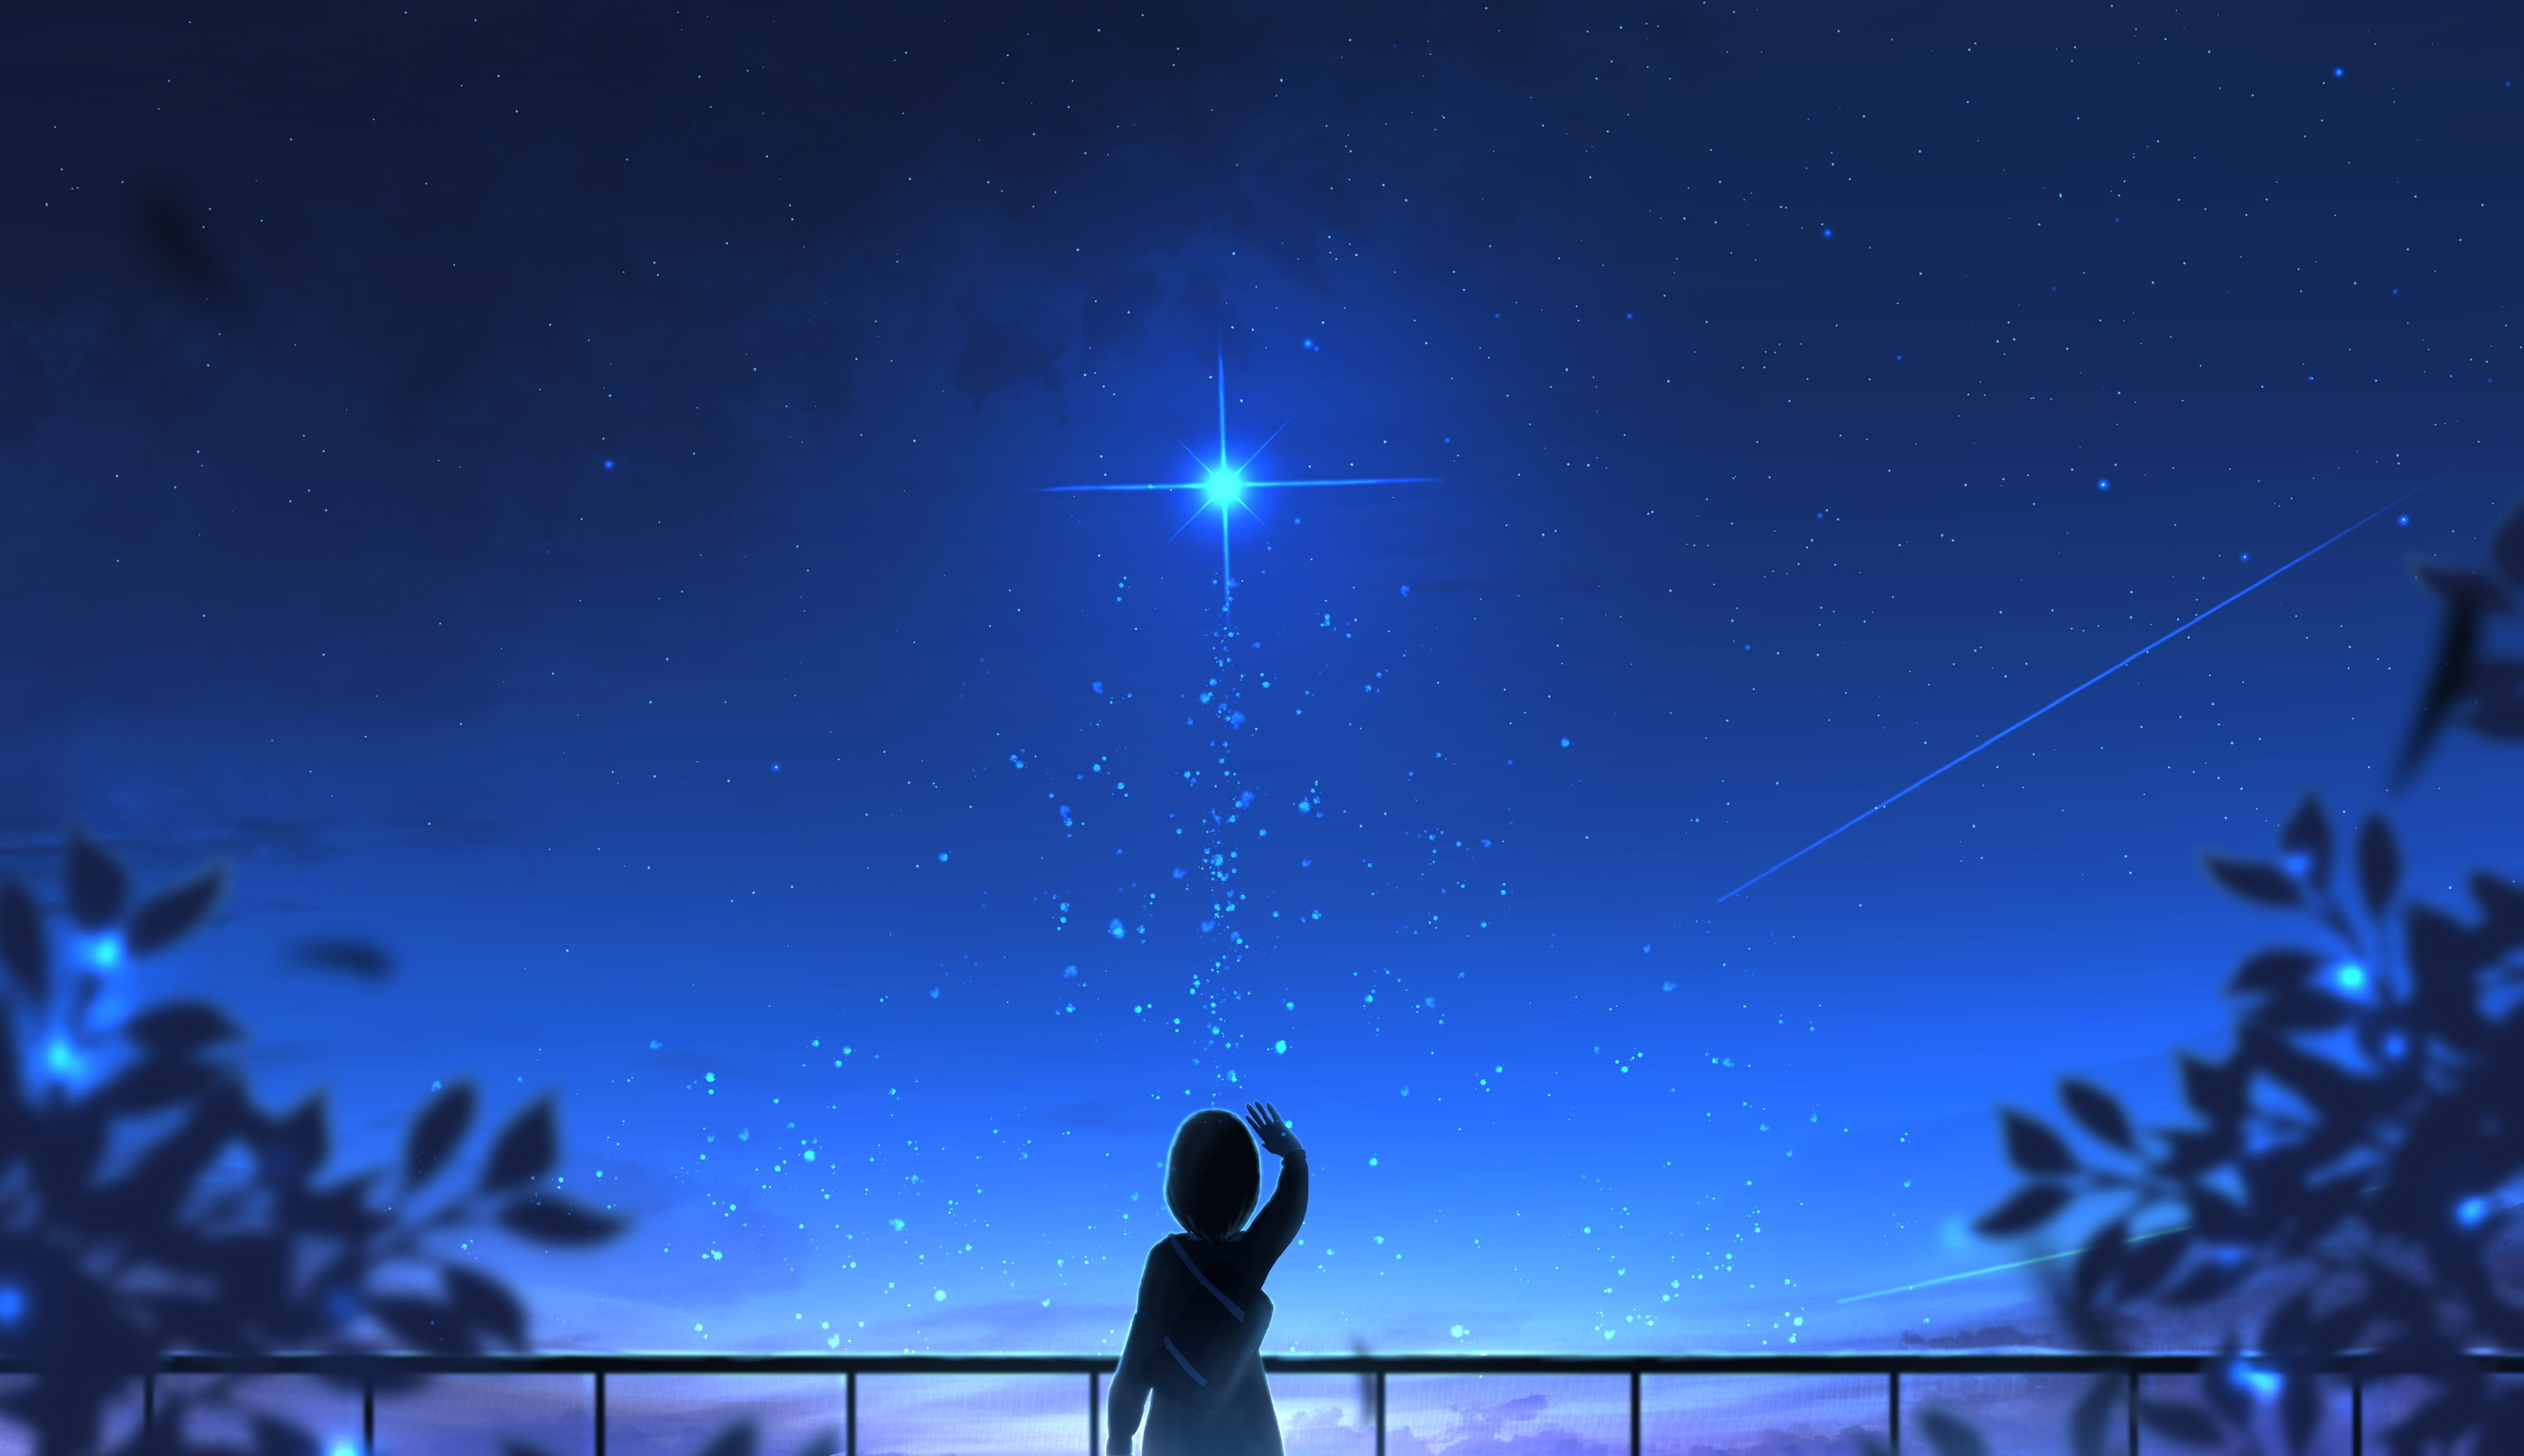 Broken Girl Looking At Sky Wallpaper Hd Anime 4k Wallpapers